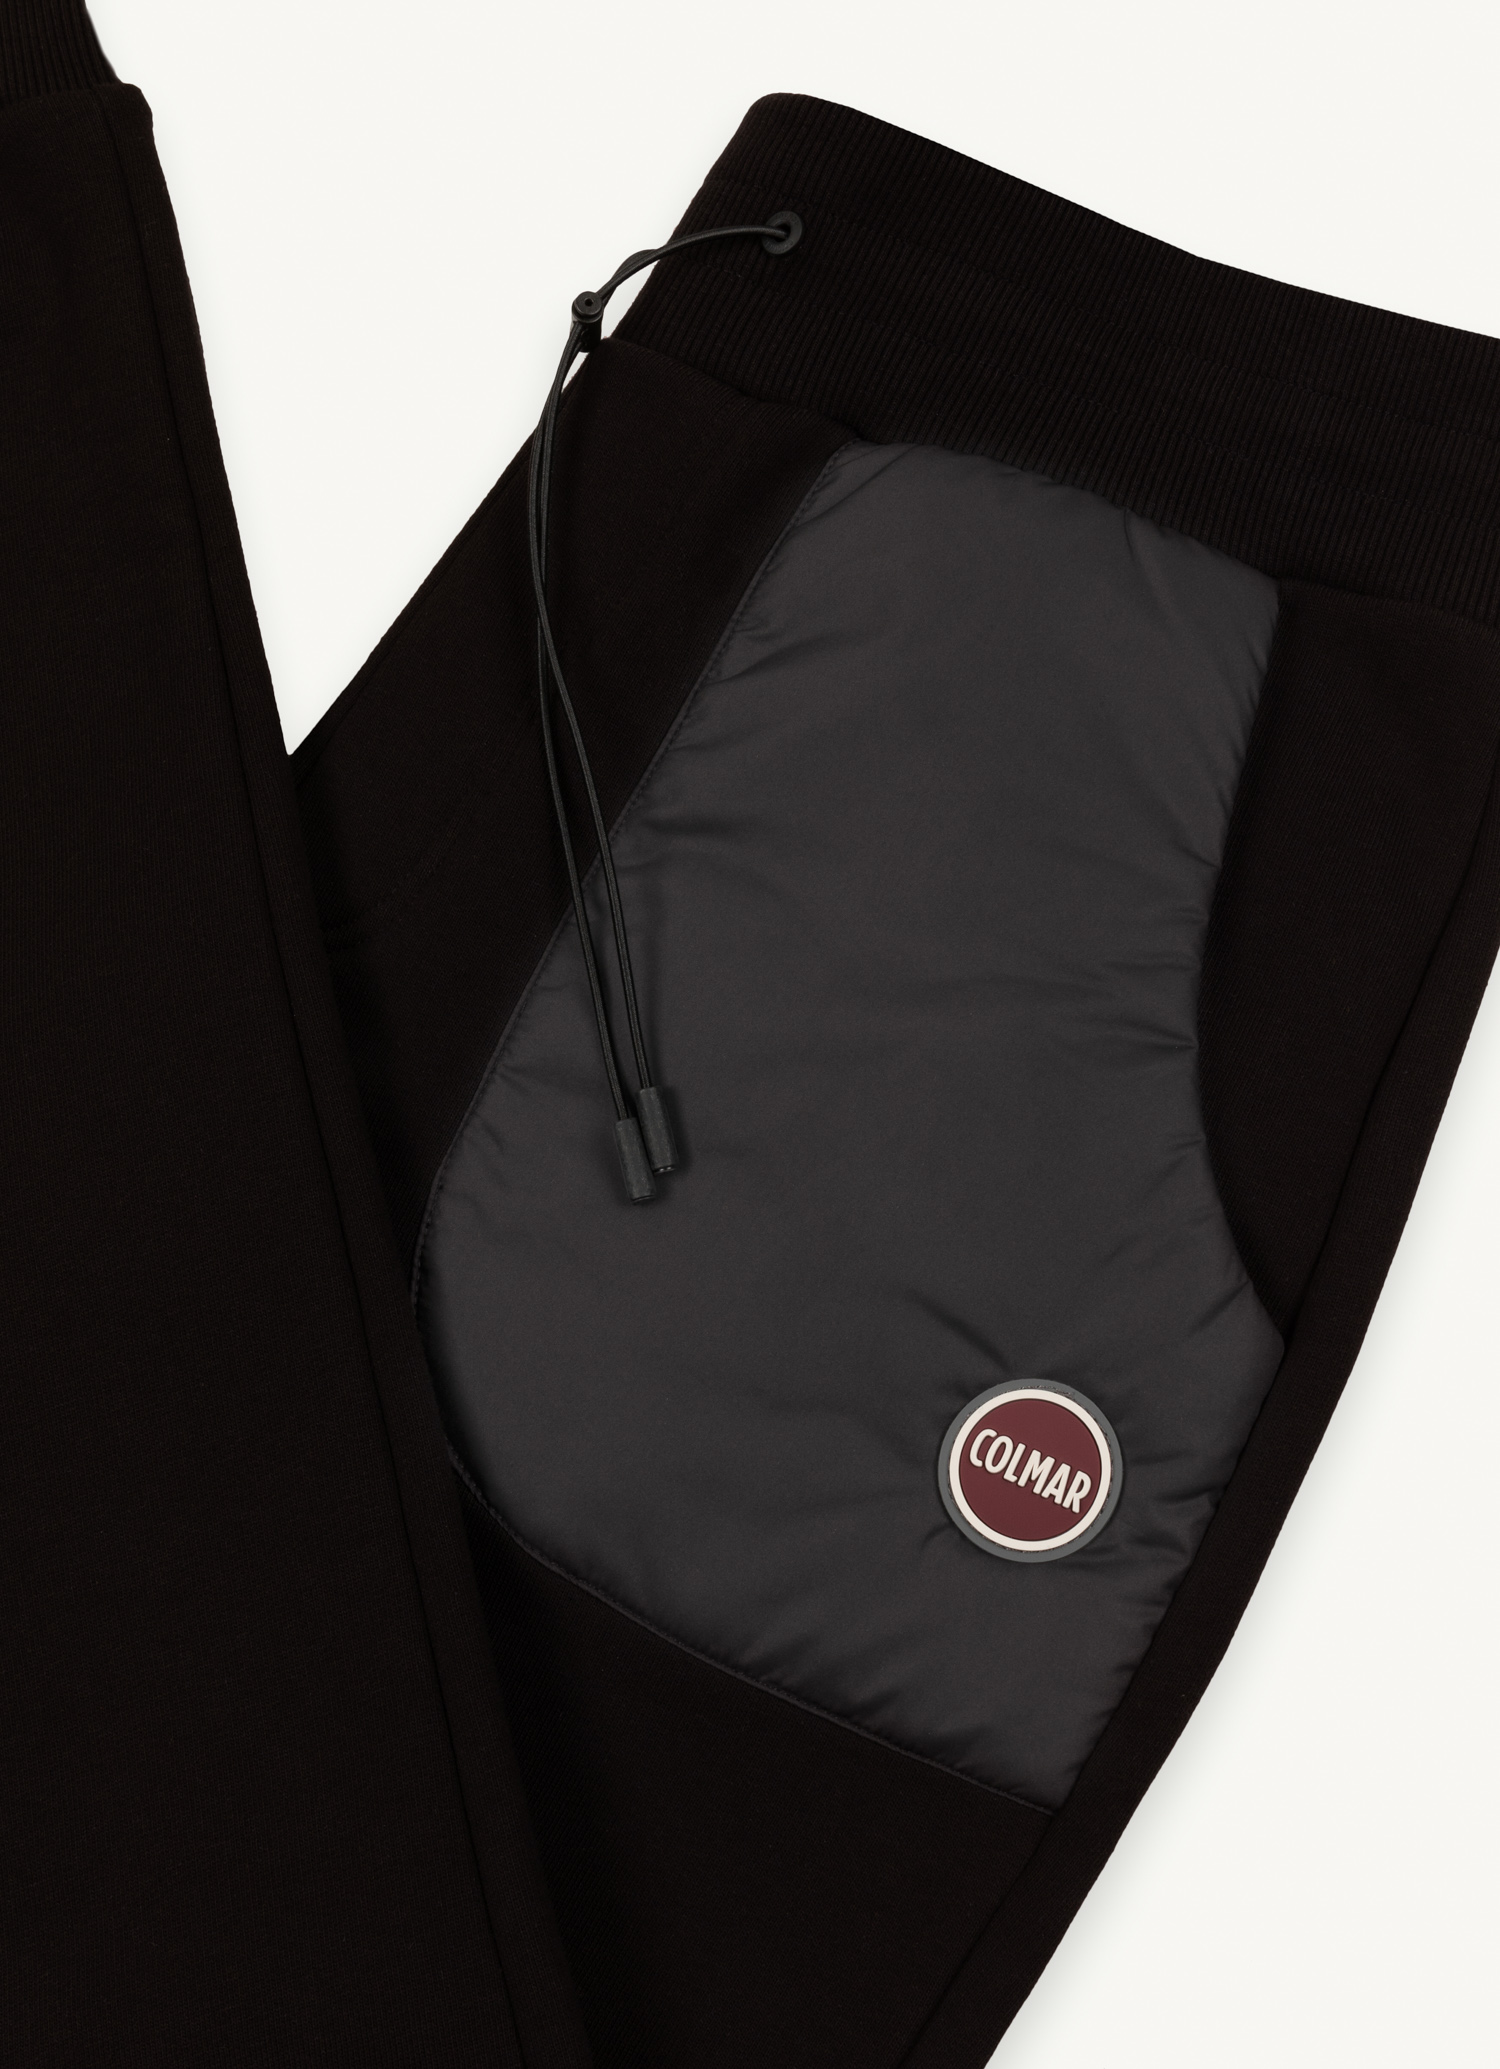 Pantaloni uomo in felpa nero Colmar   82339UX99